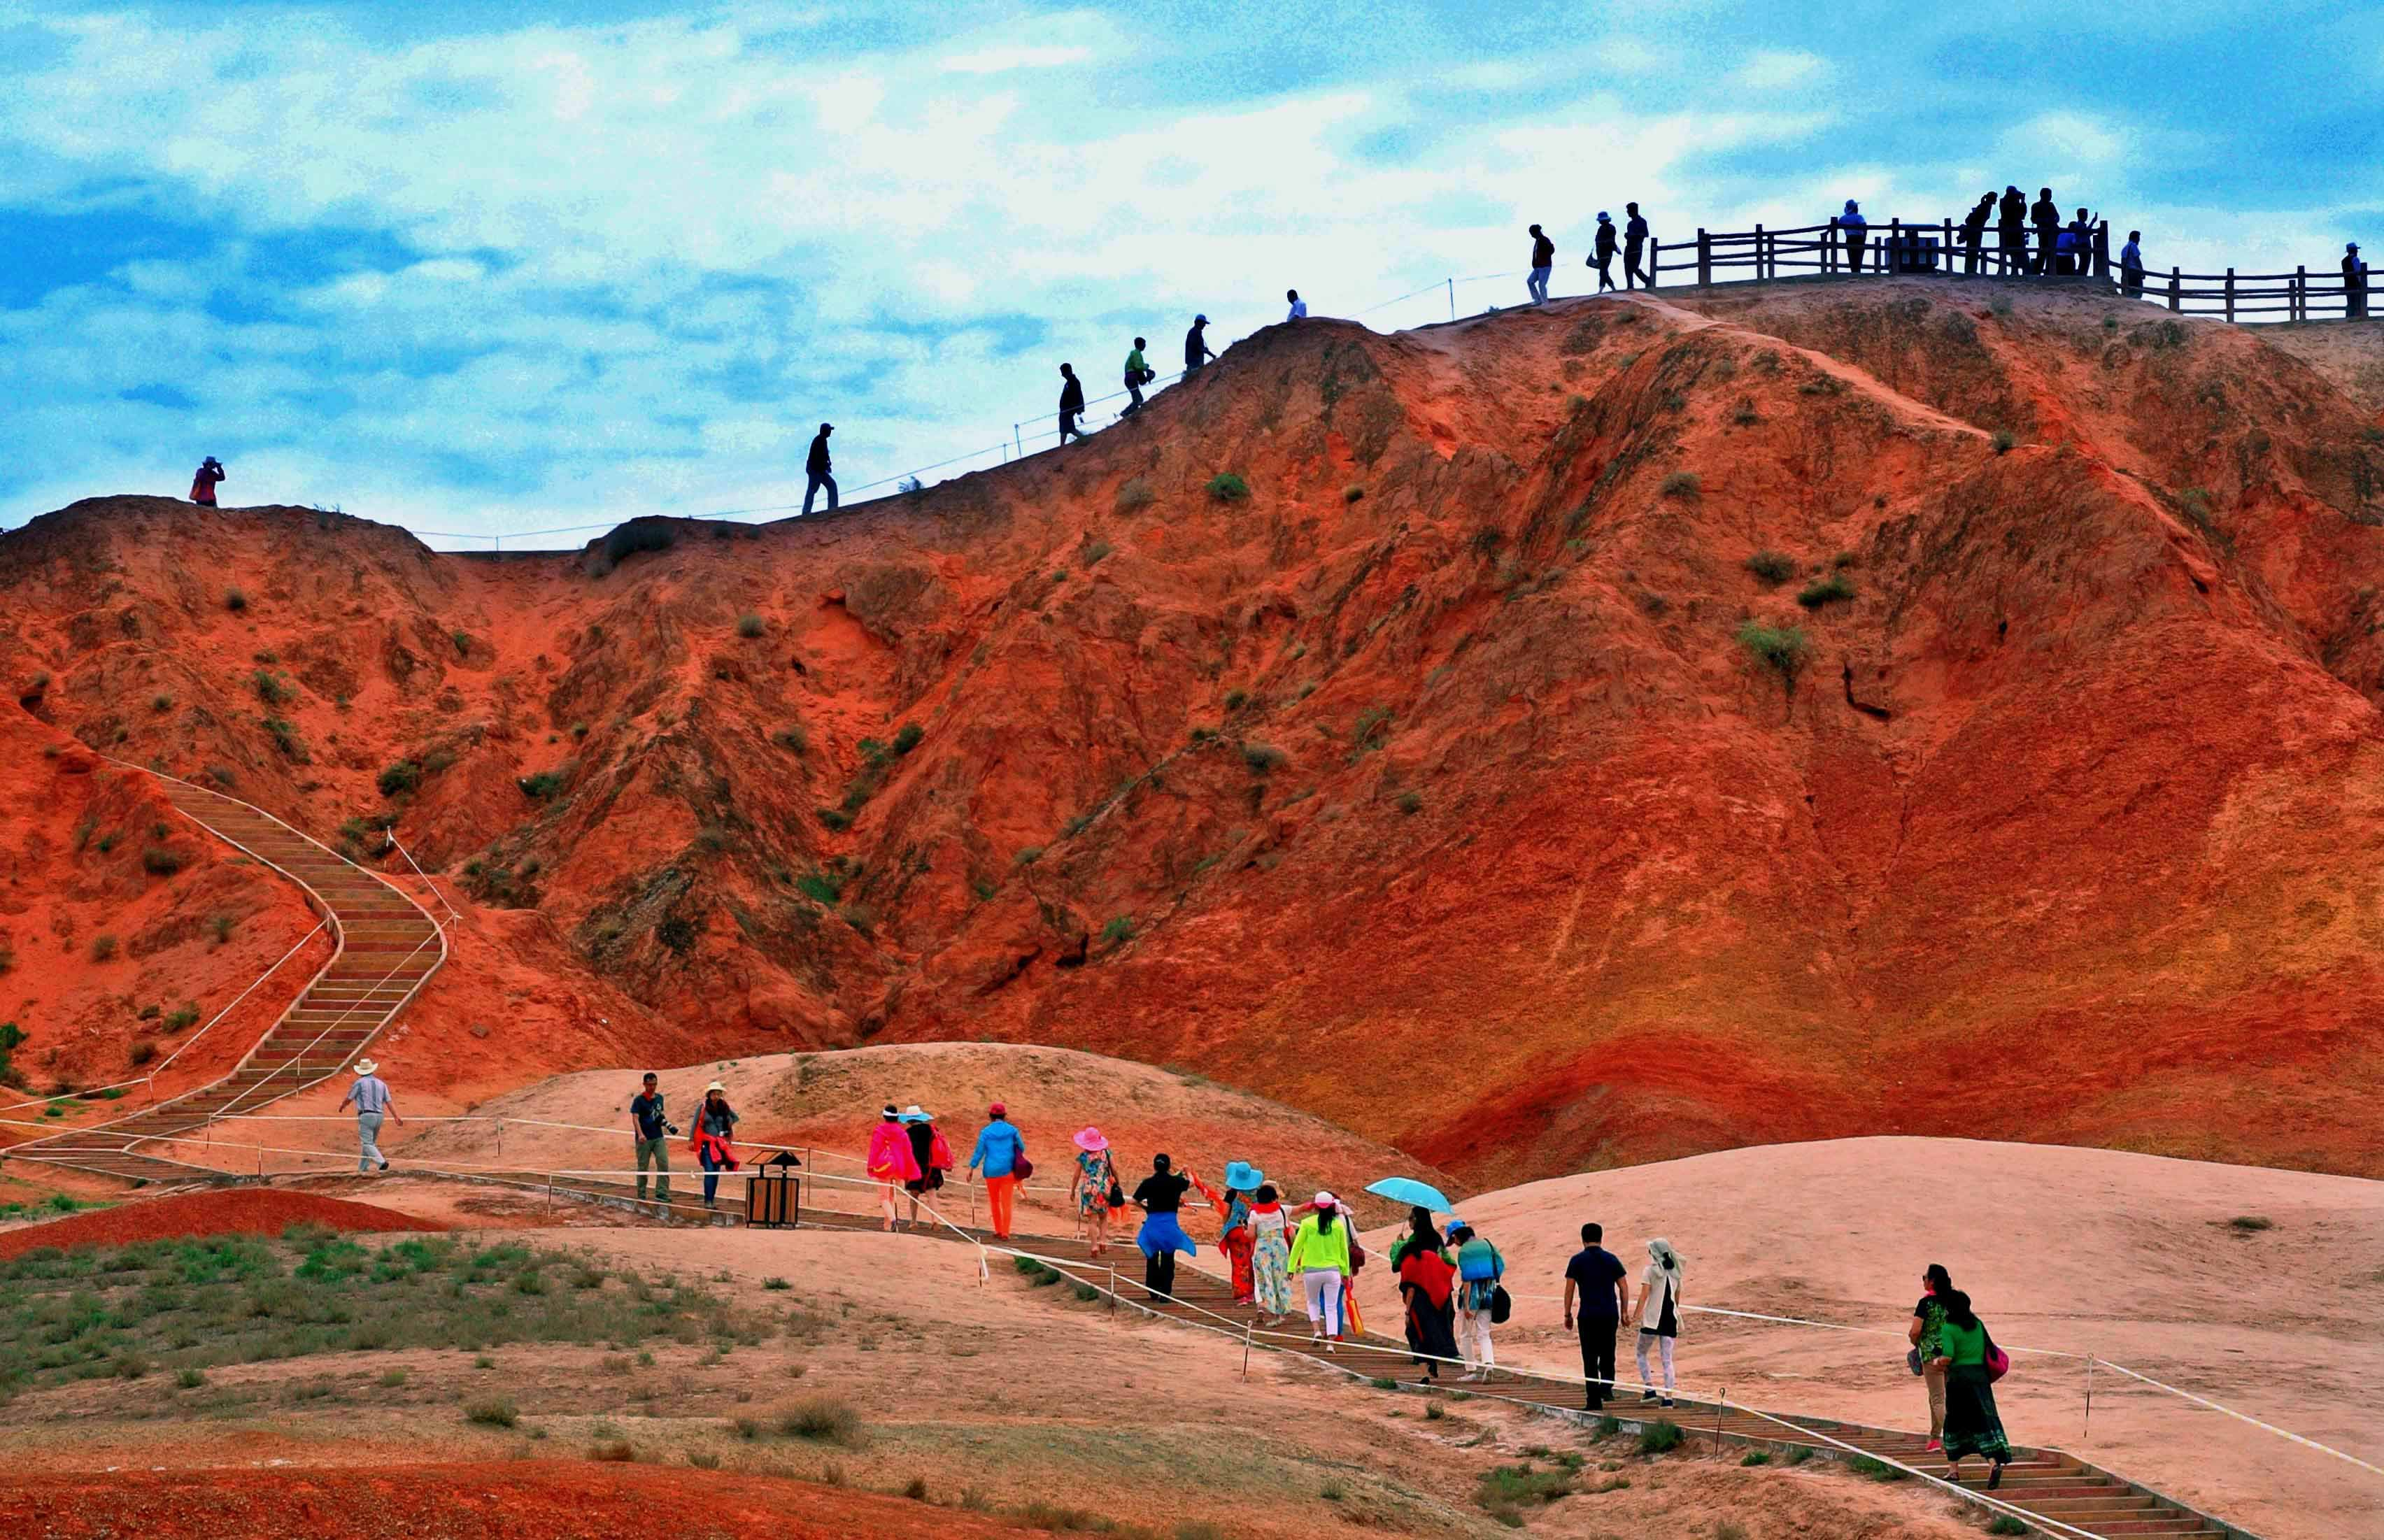 Visitors take in the  scenery at Zhangye Danxia Landform Geological Park in Zhangye City, Gansu Province, northwest China, July 7, 2014.